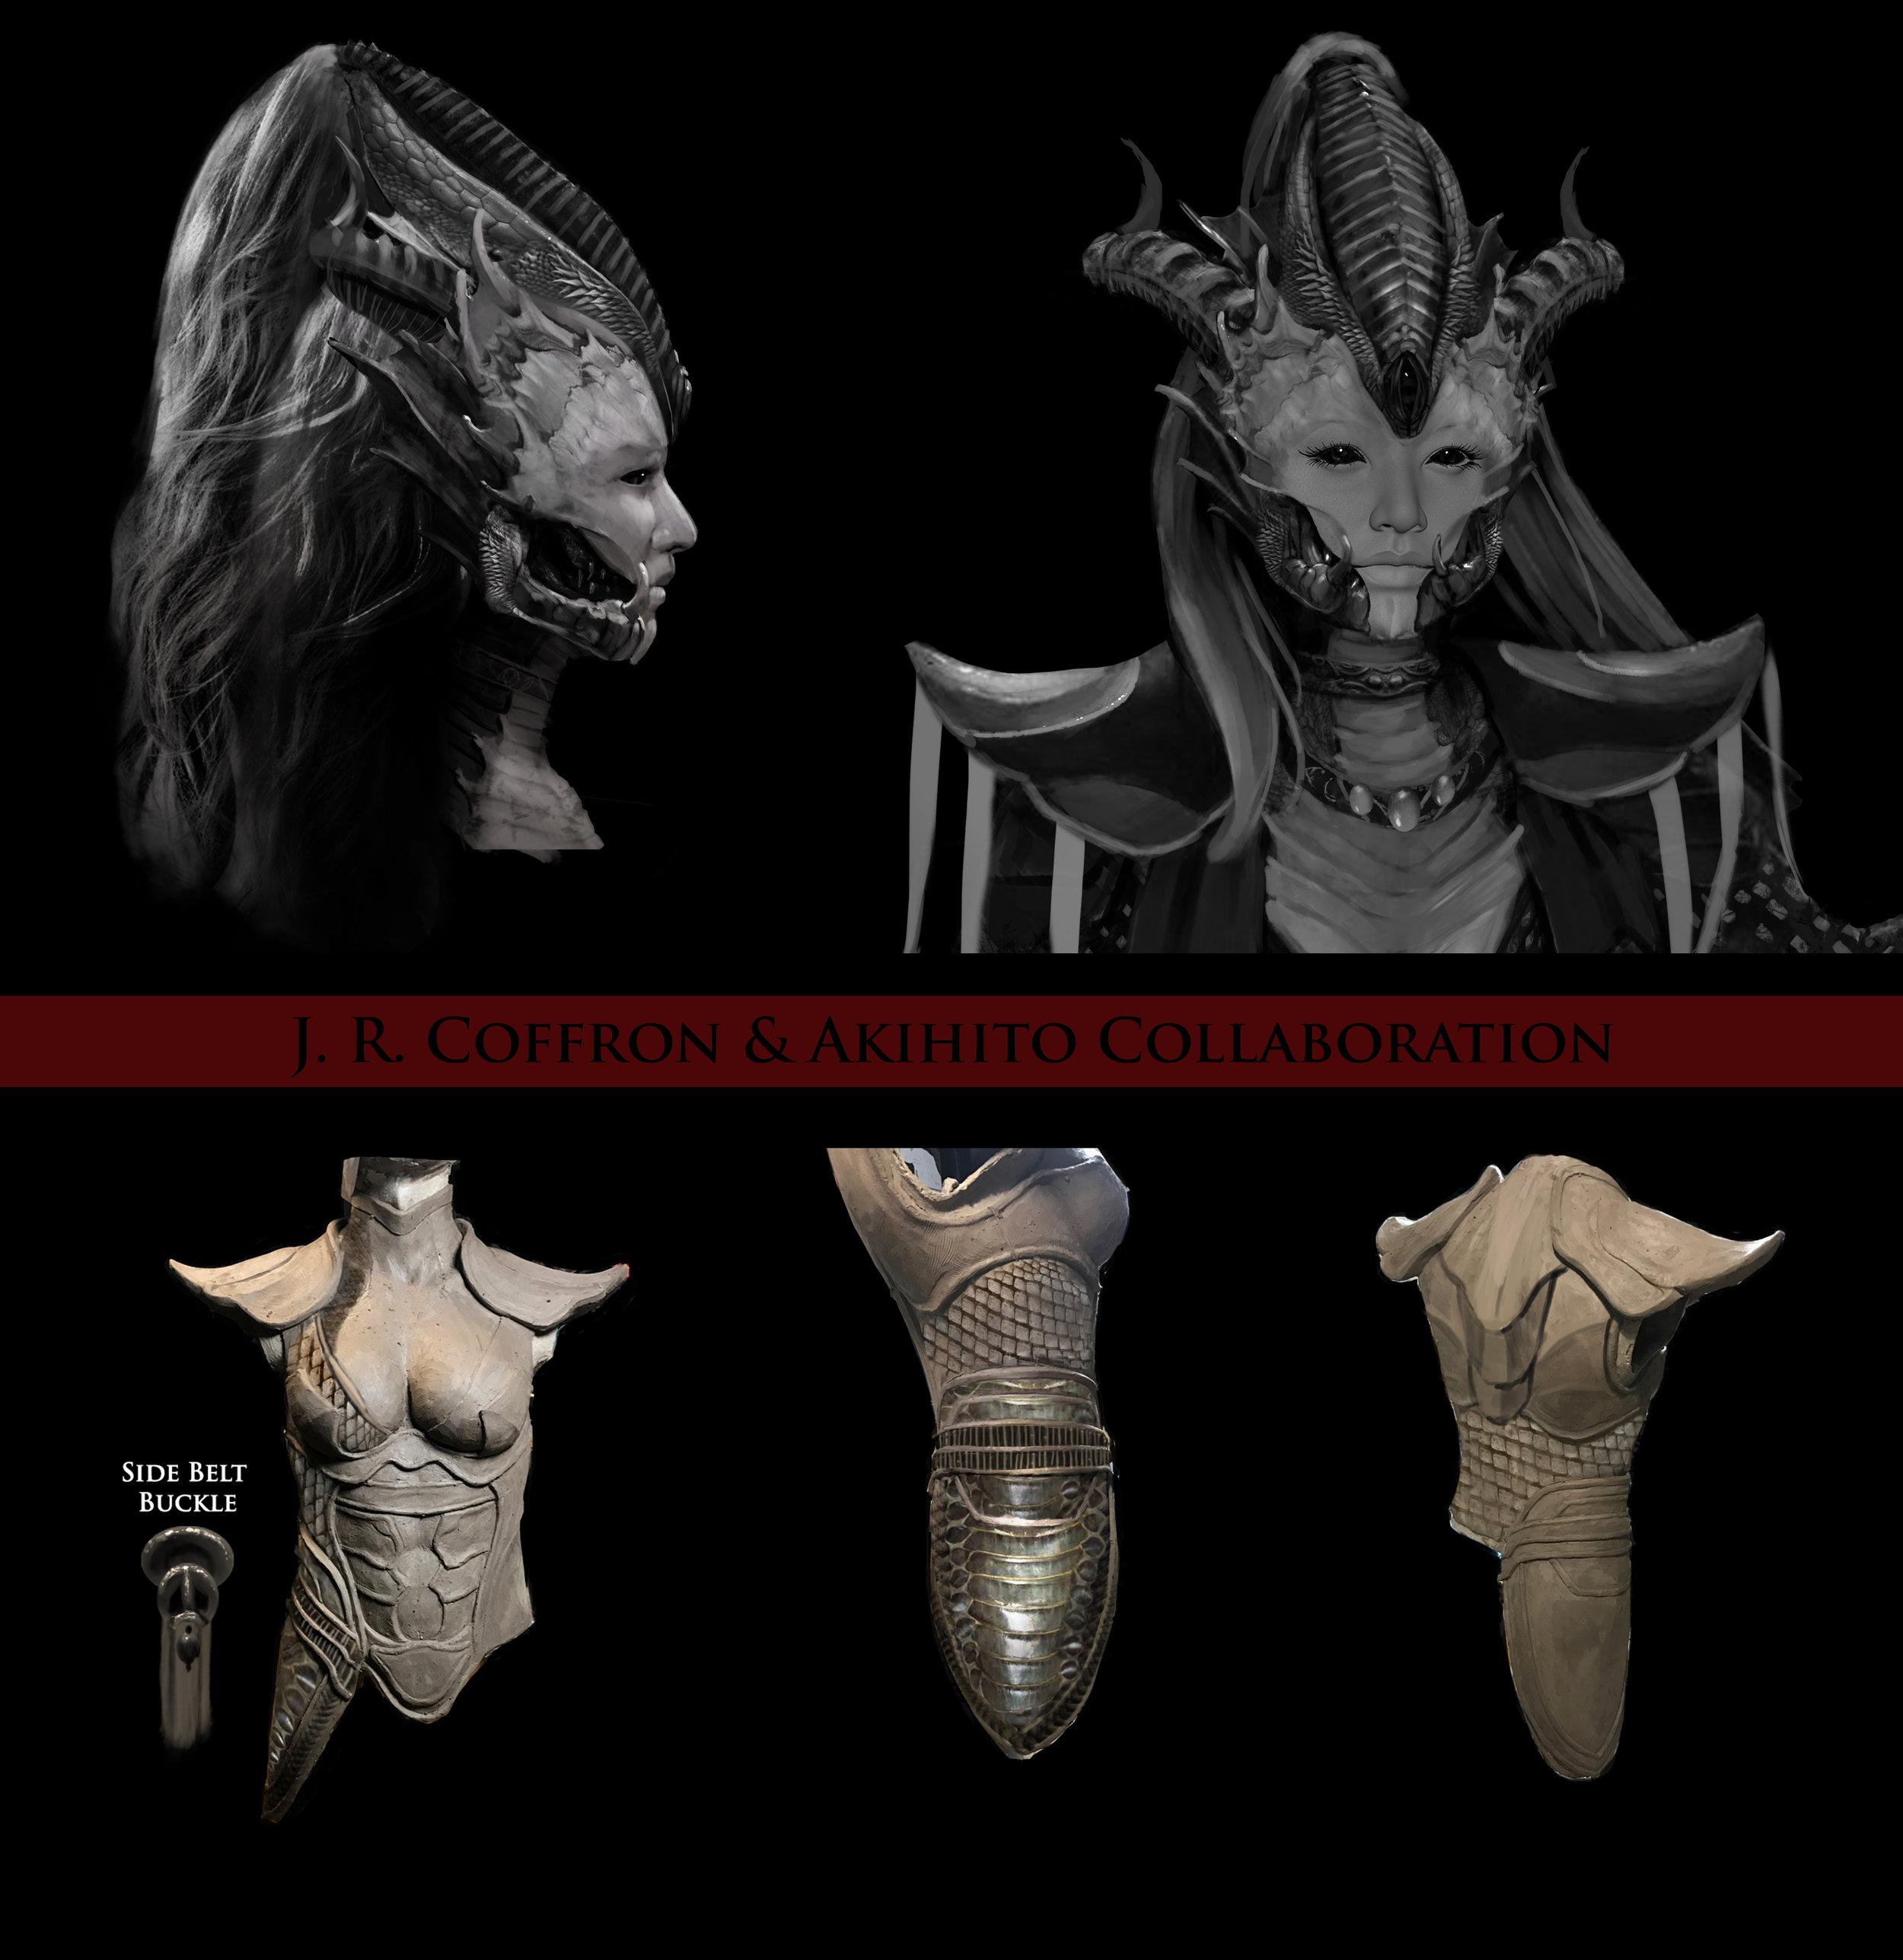 Ikeda_Coffron_collab_head_armor.jpg